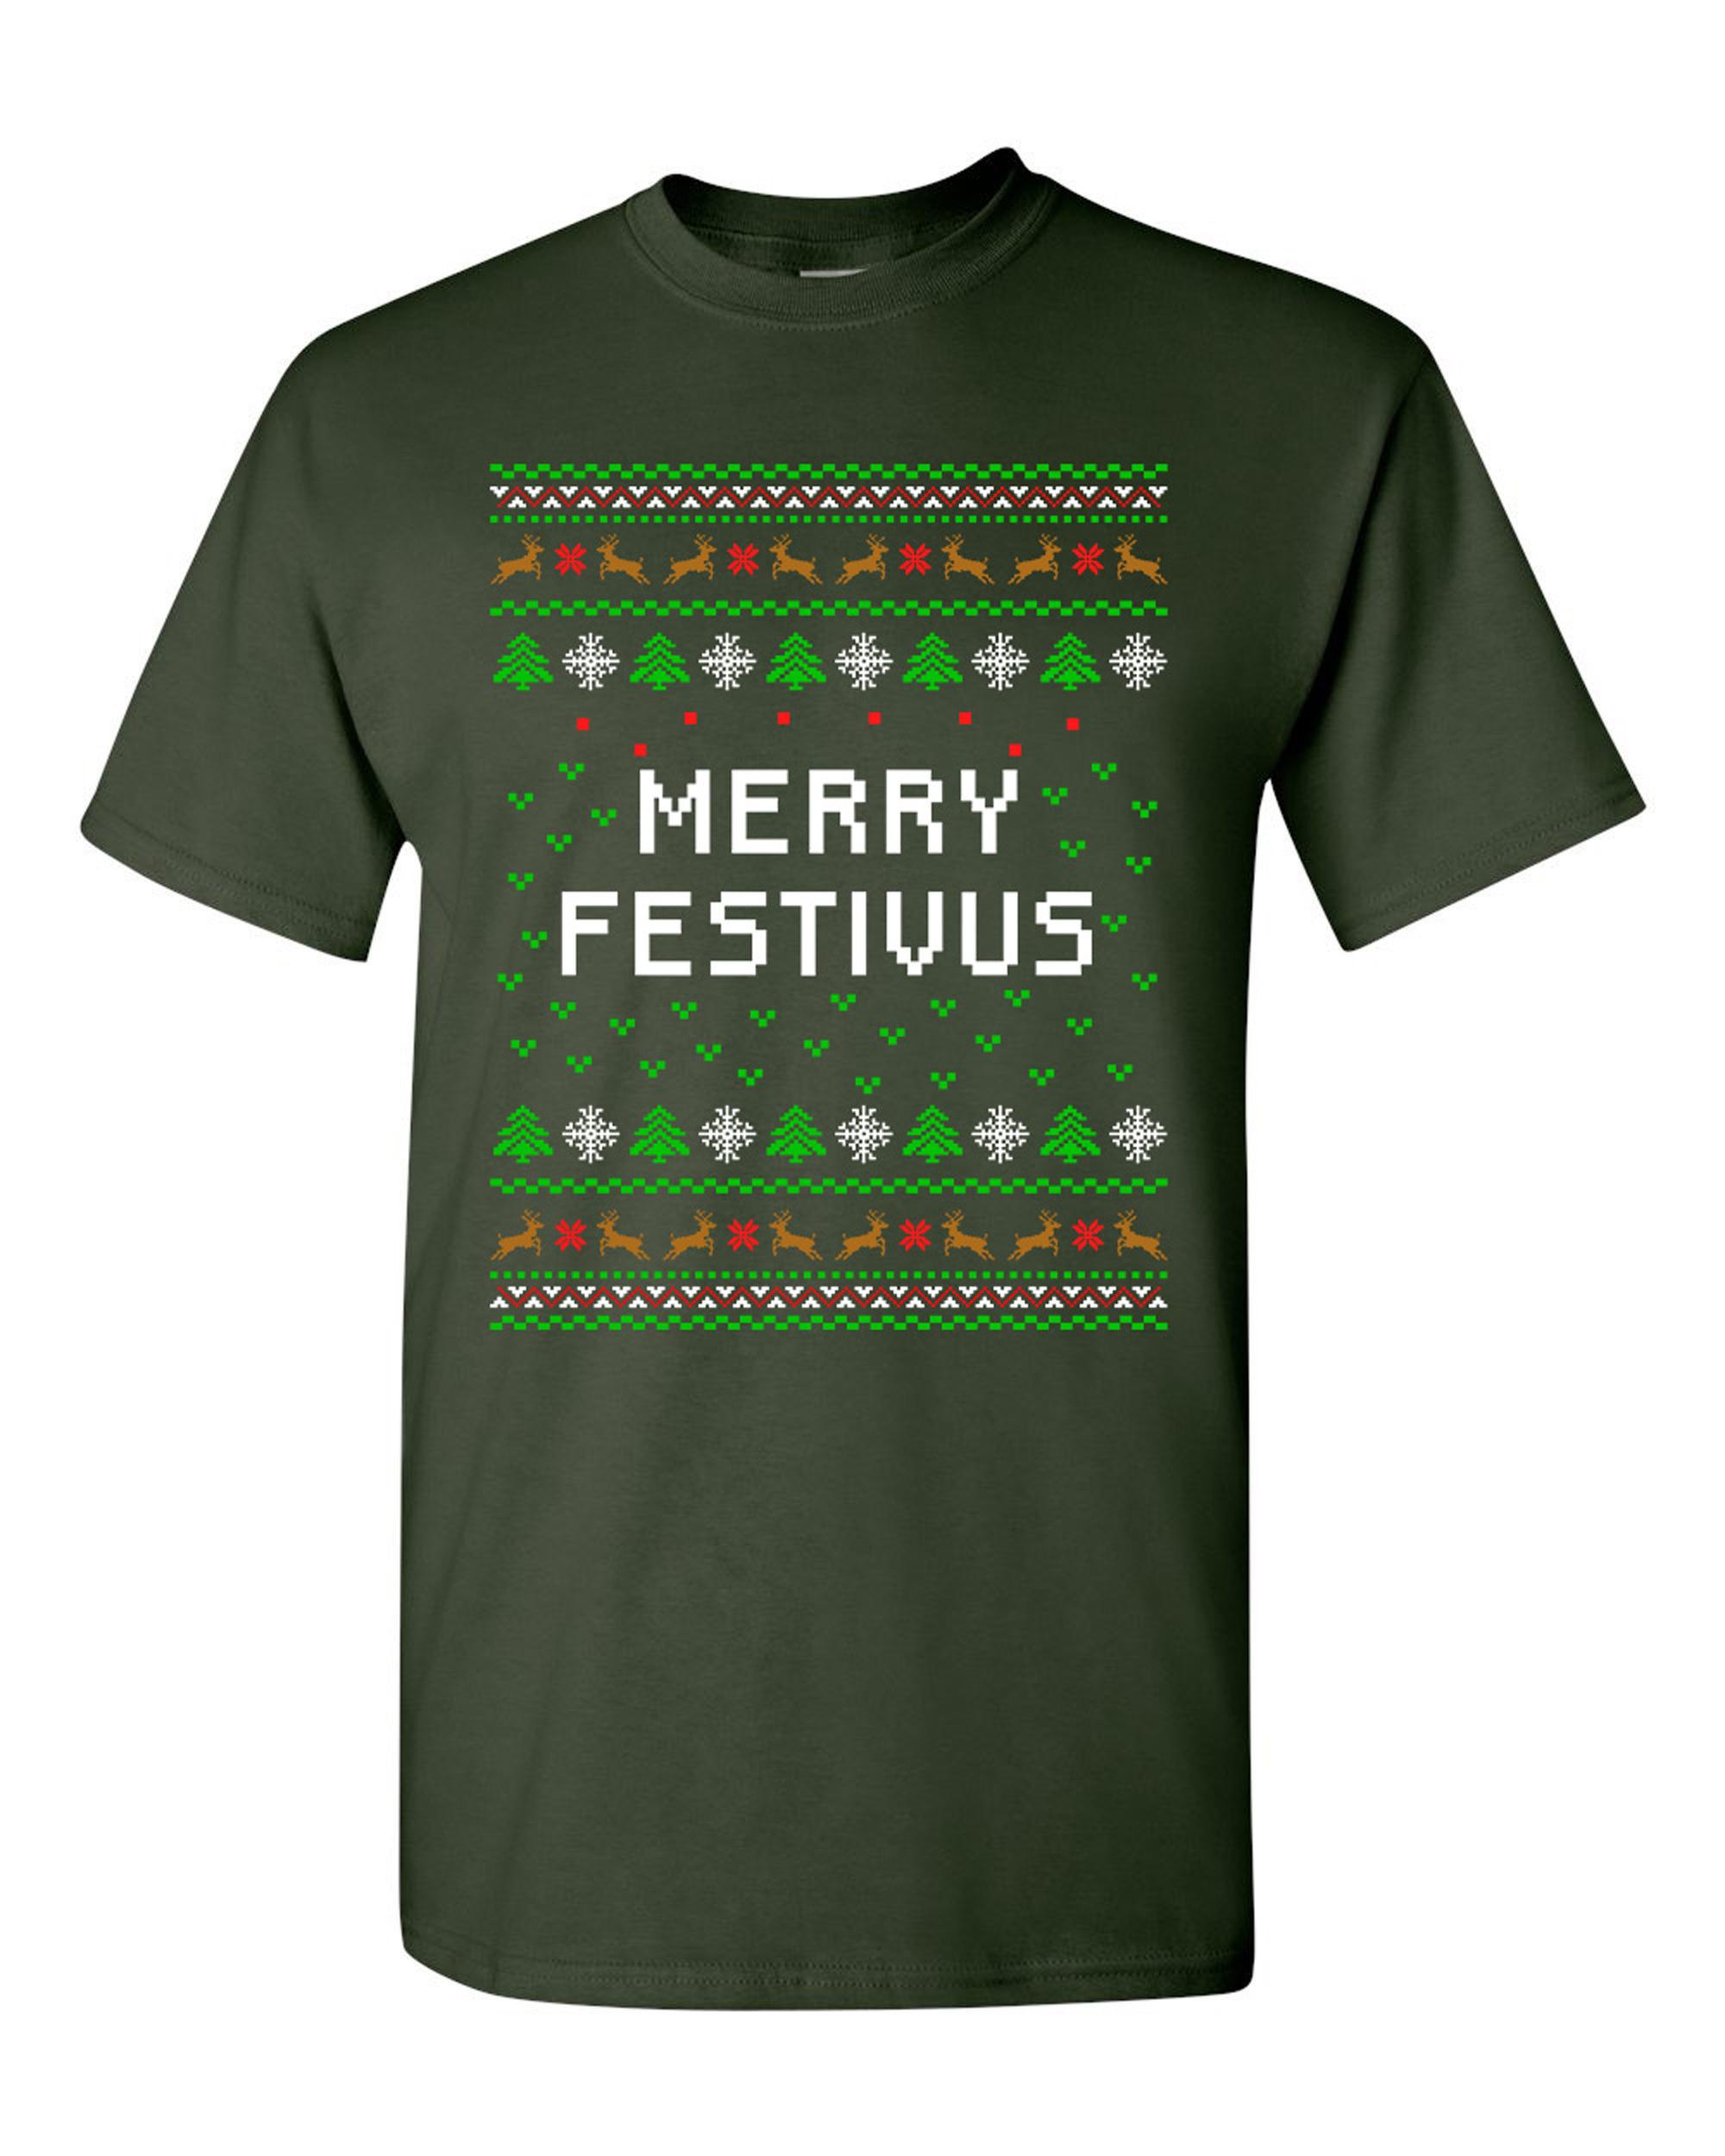 Merry Festivus Ugly Christmas Season Parody Funny DT Adult T-Shirt Tee